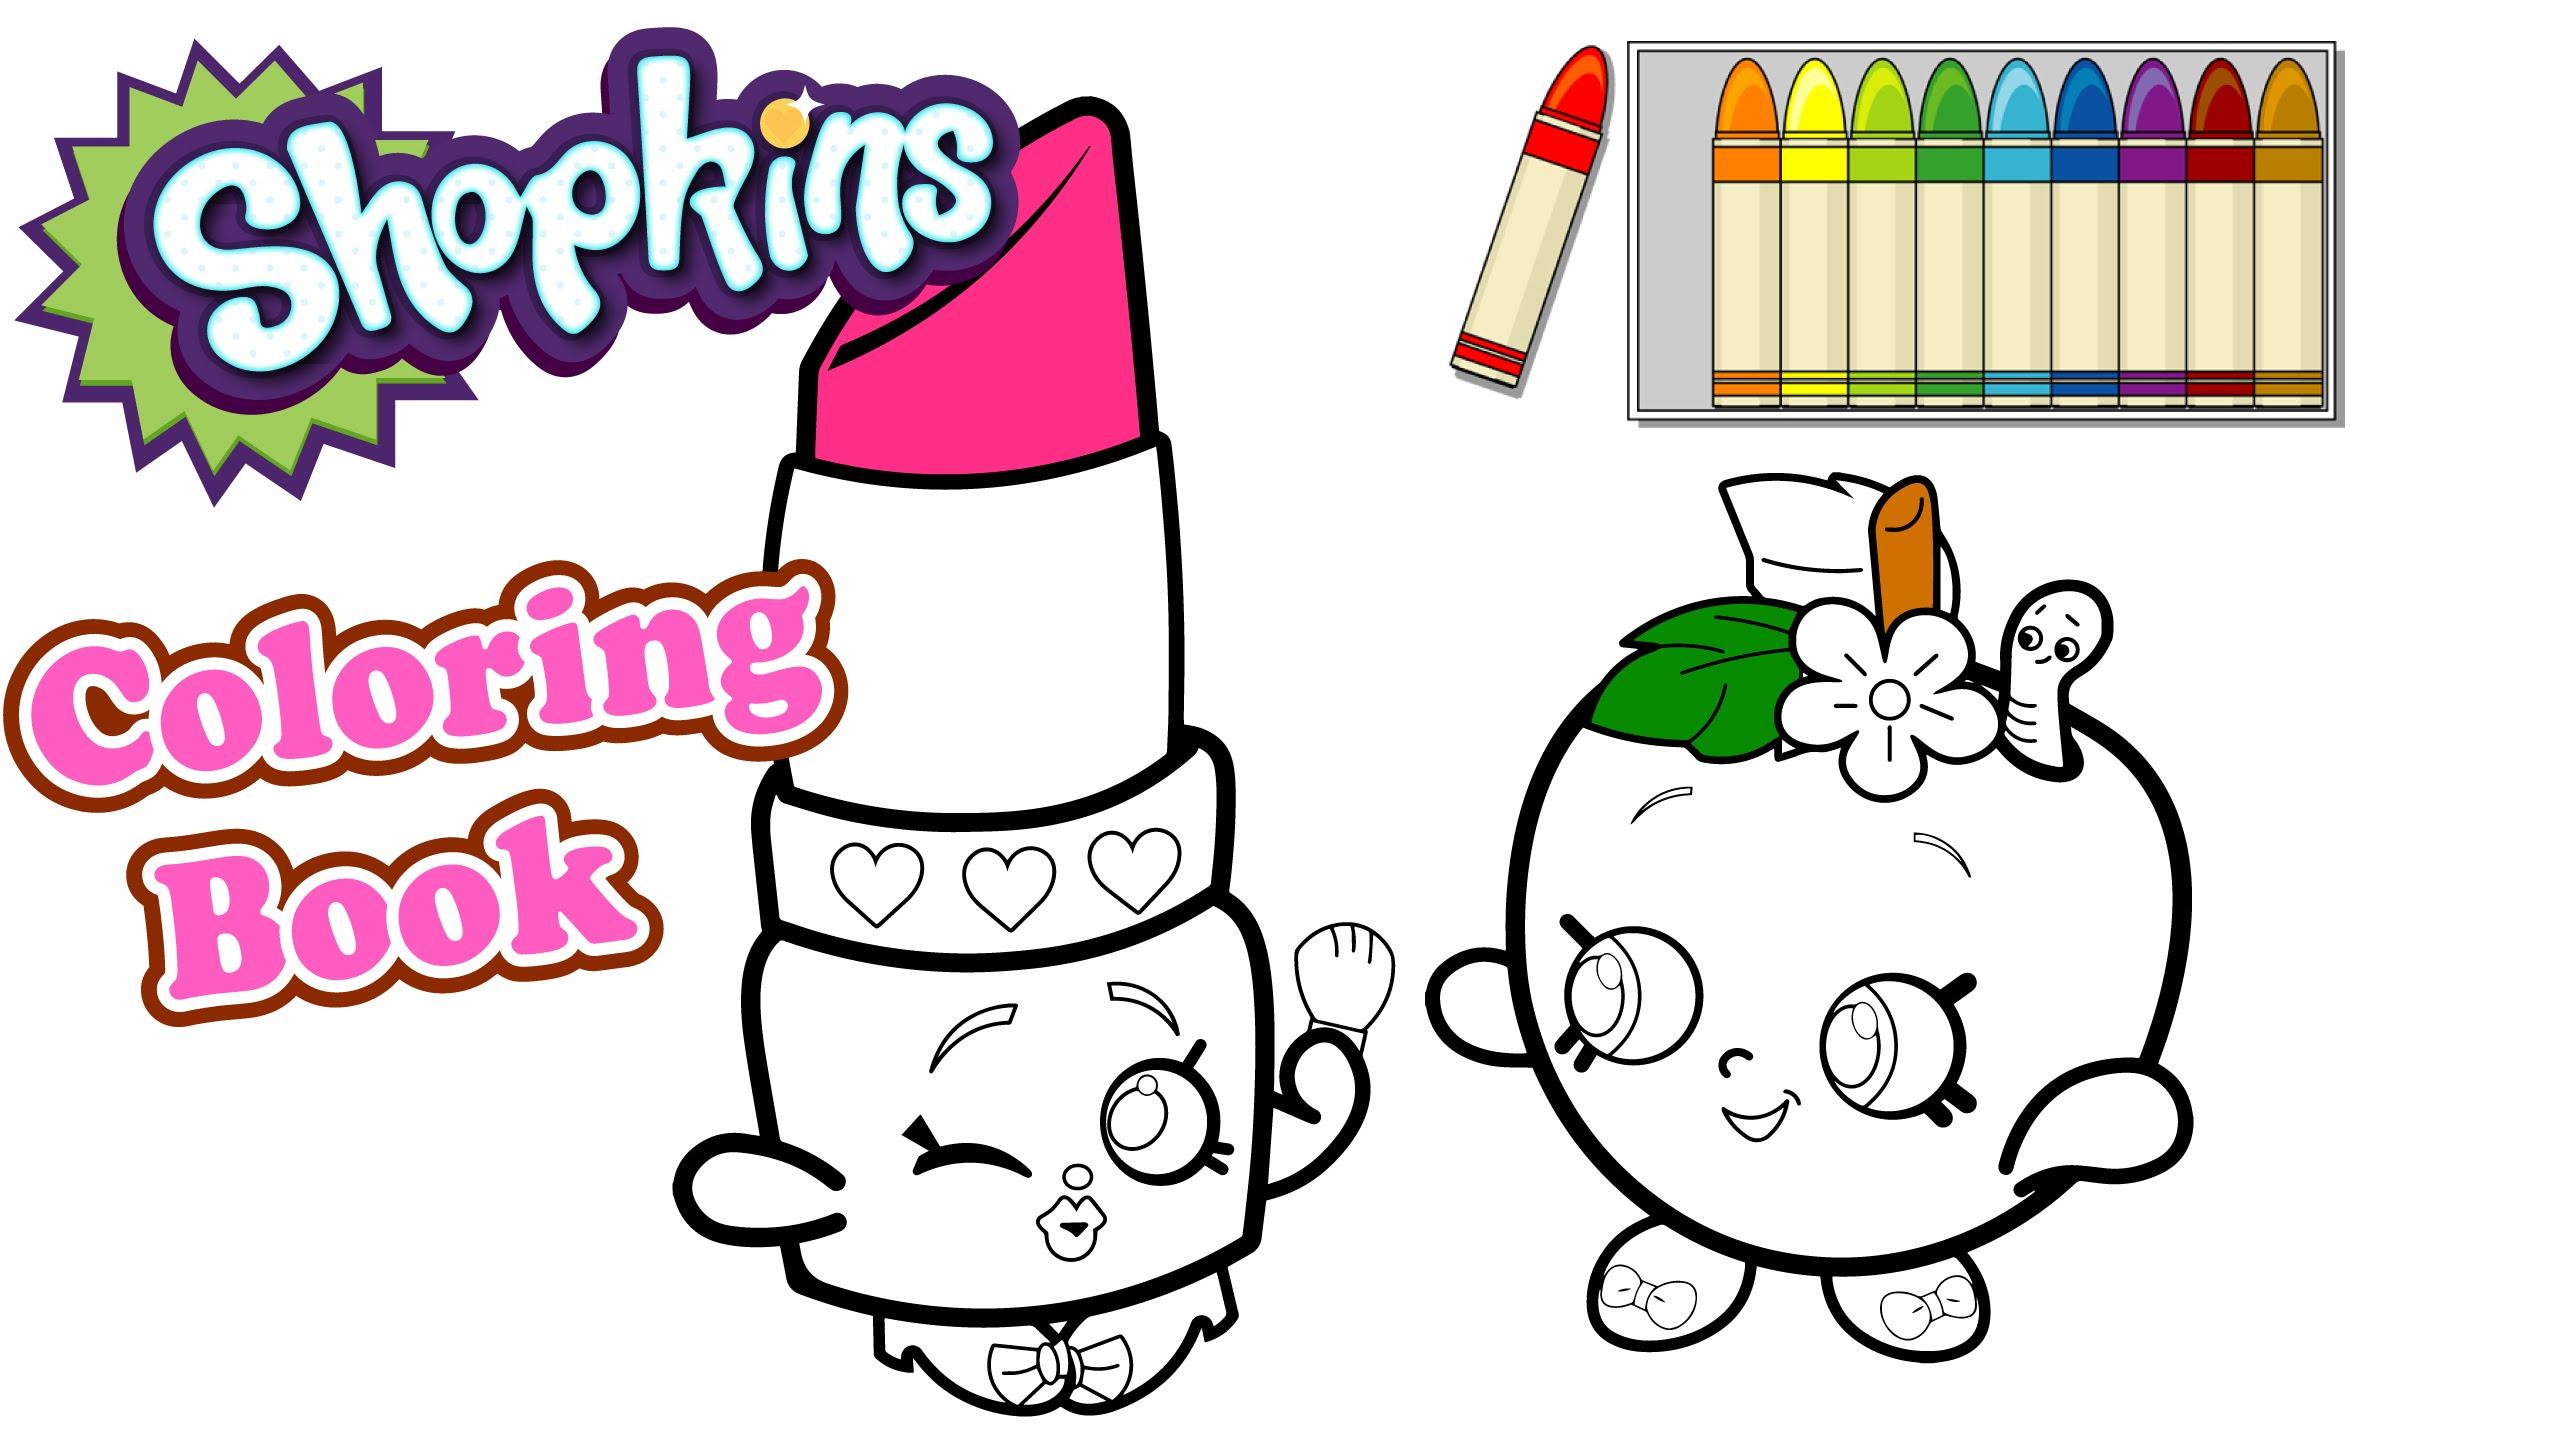 2560x1440 Shopkins Lipstick Coloring Pages  2684329